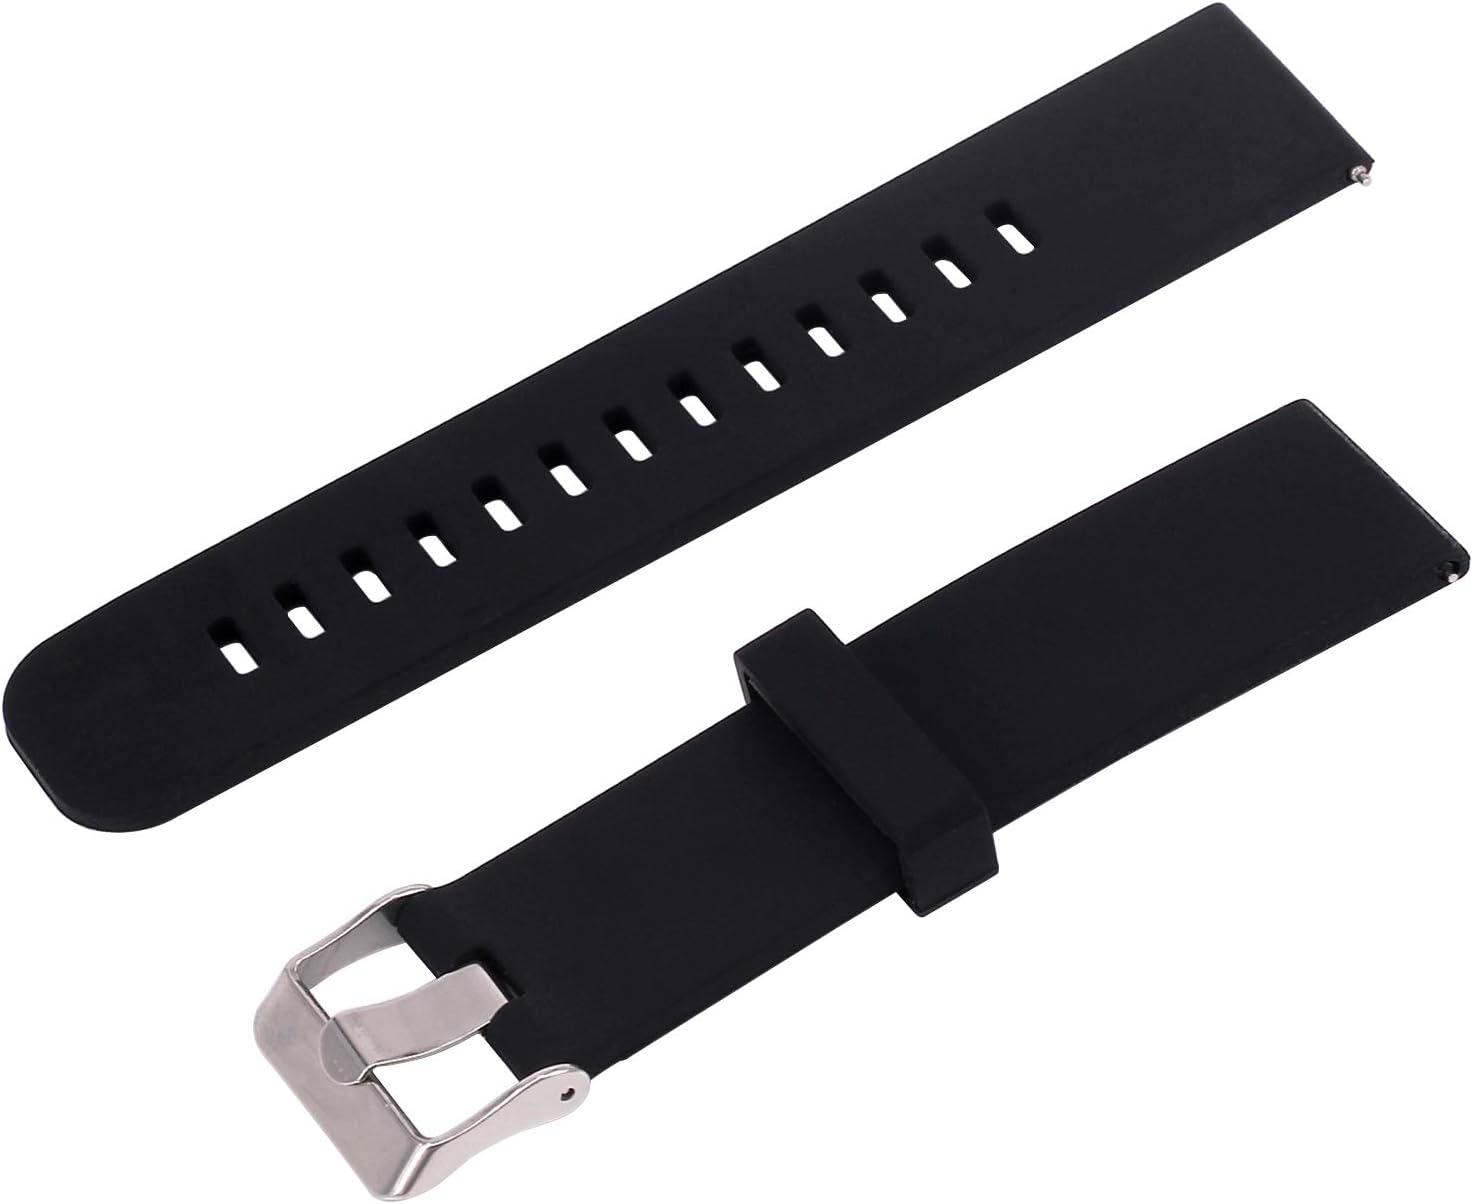 Malla para reloj  Live R382, LG G Watch W100/W110/W150